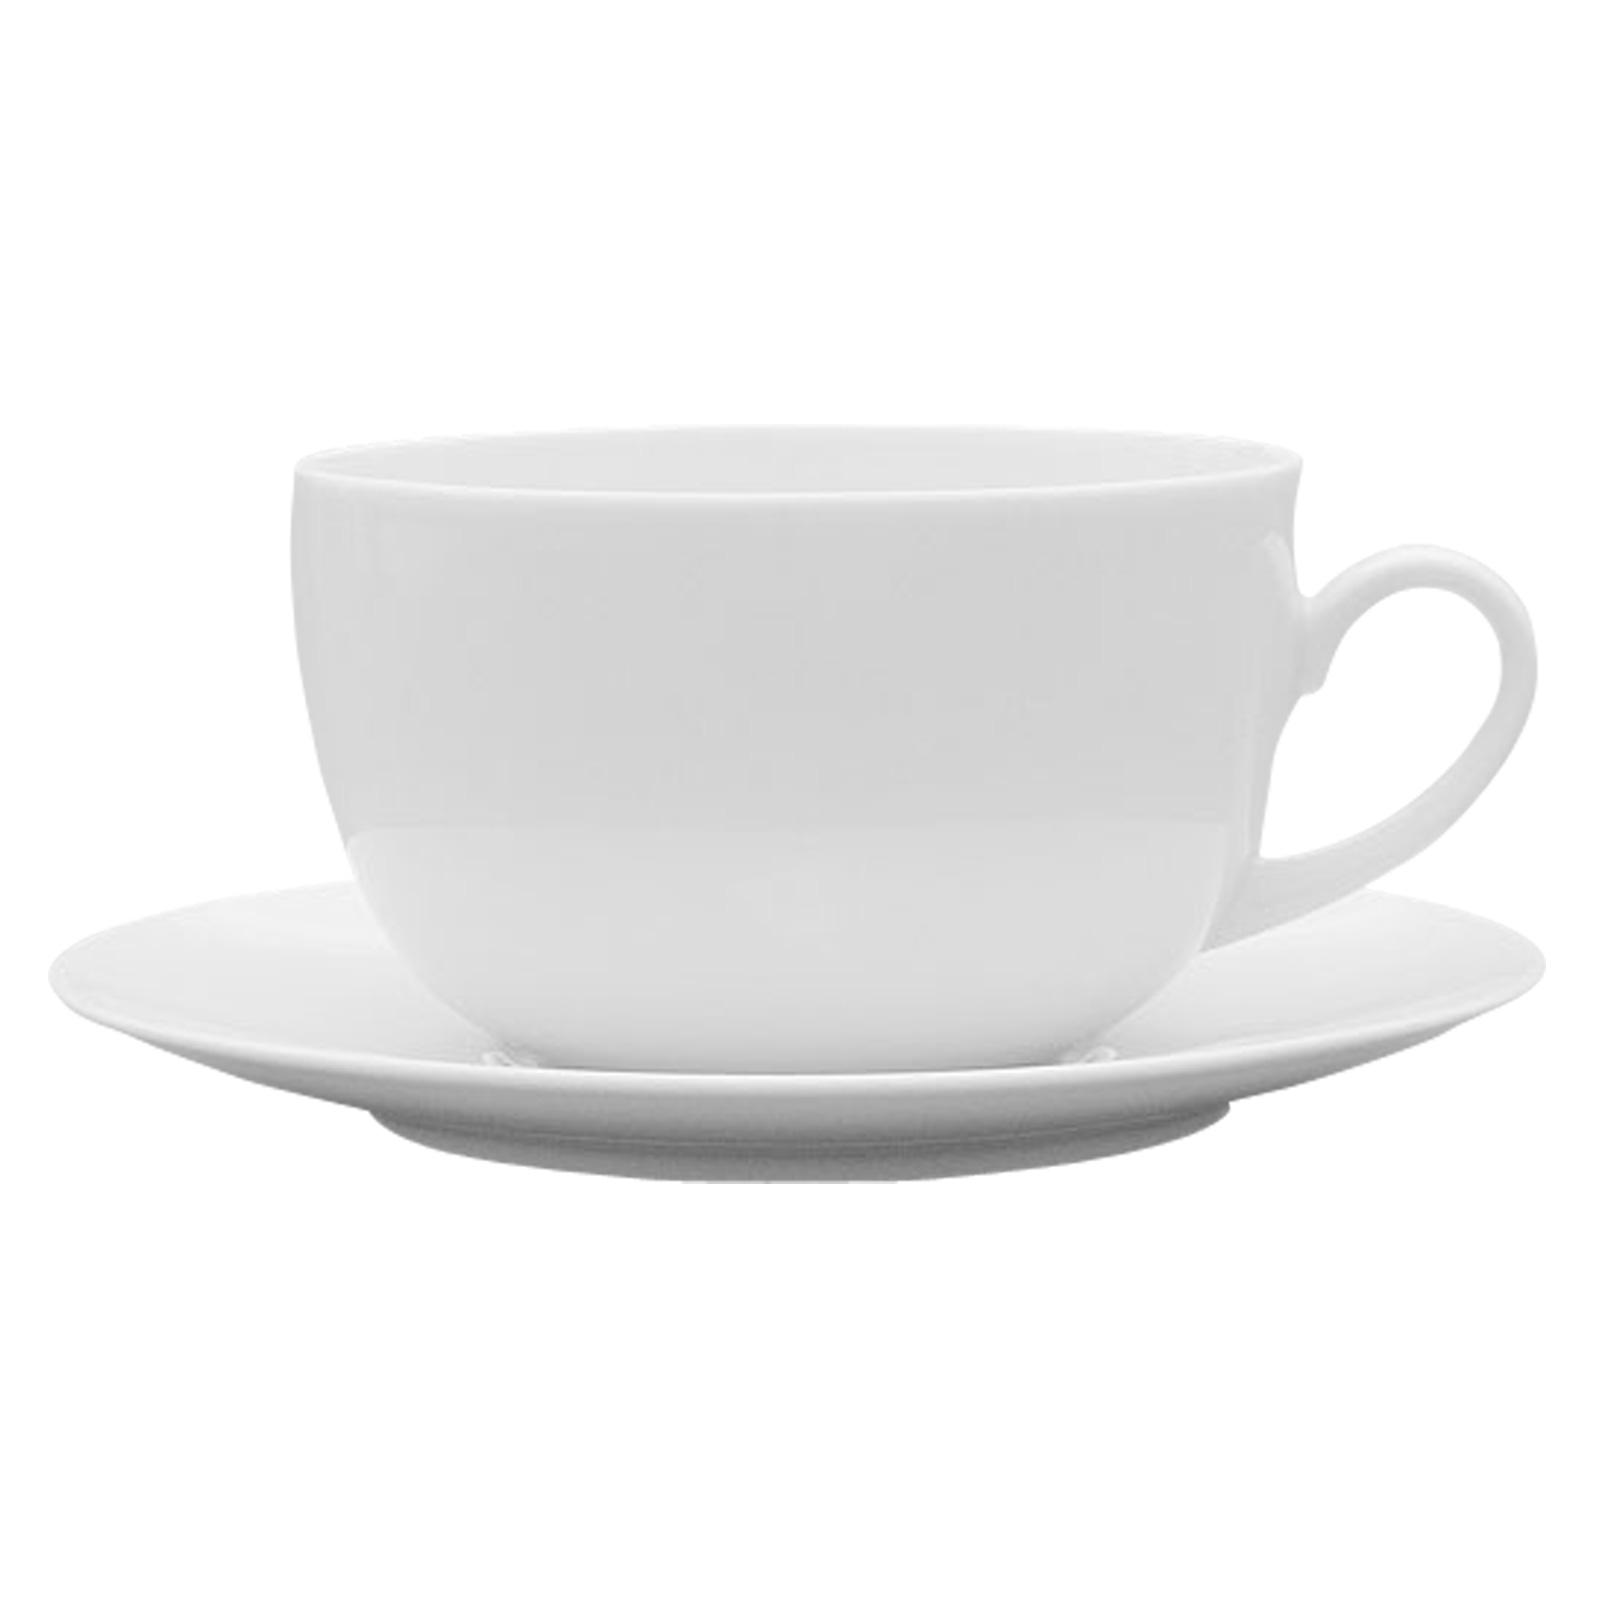 Sonia Tea Saucer